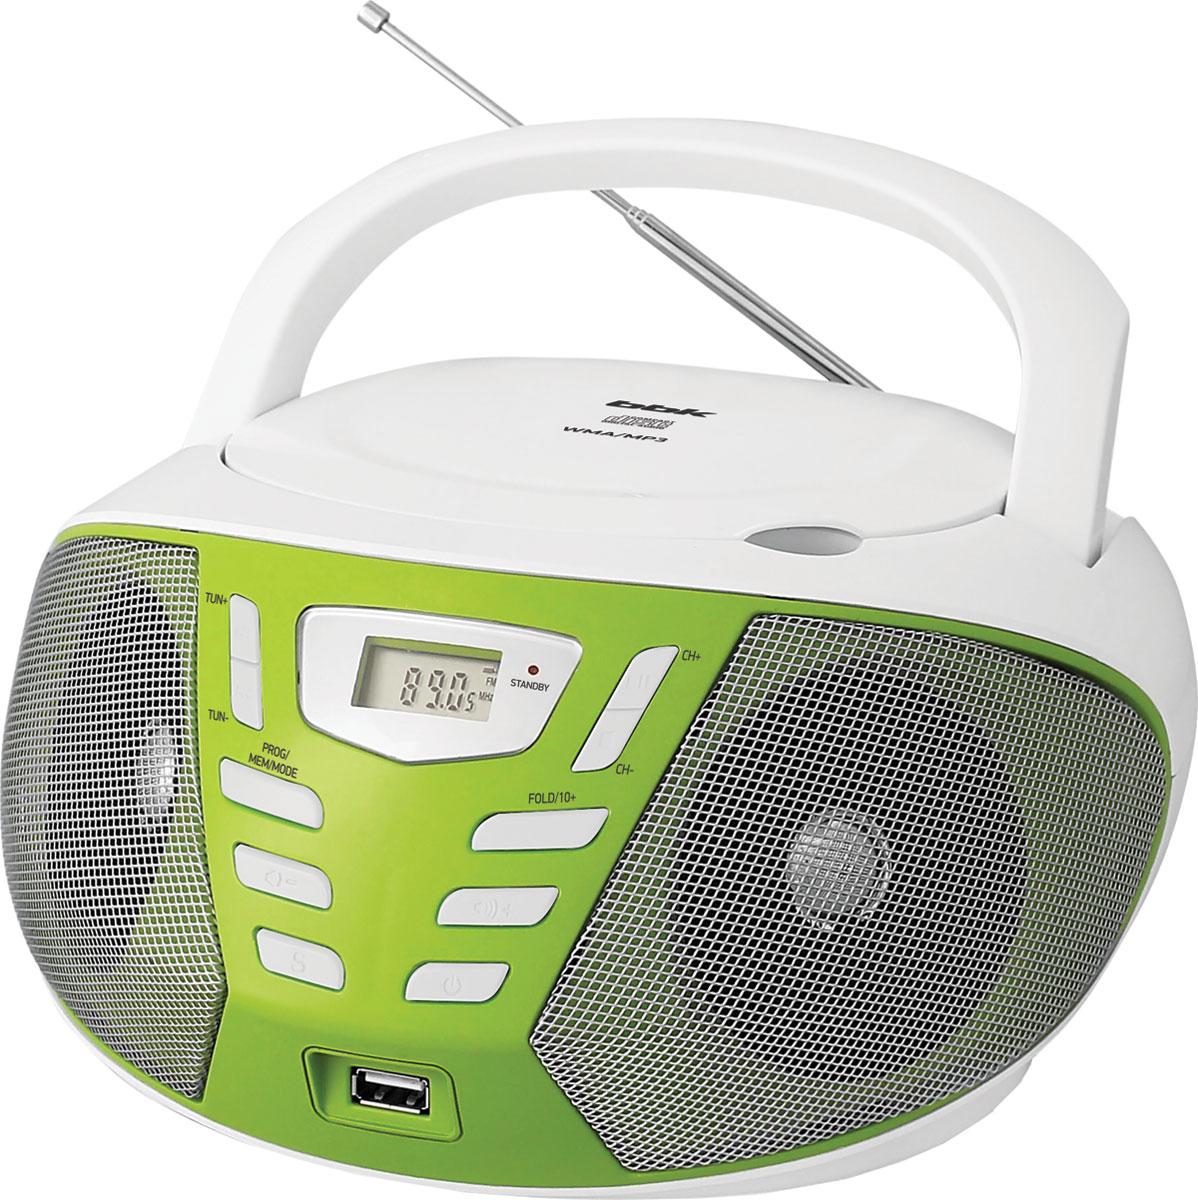 Магнитола BBK BX193U, White Green CD/MP3 магнитола bbk bx193u white green